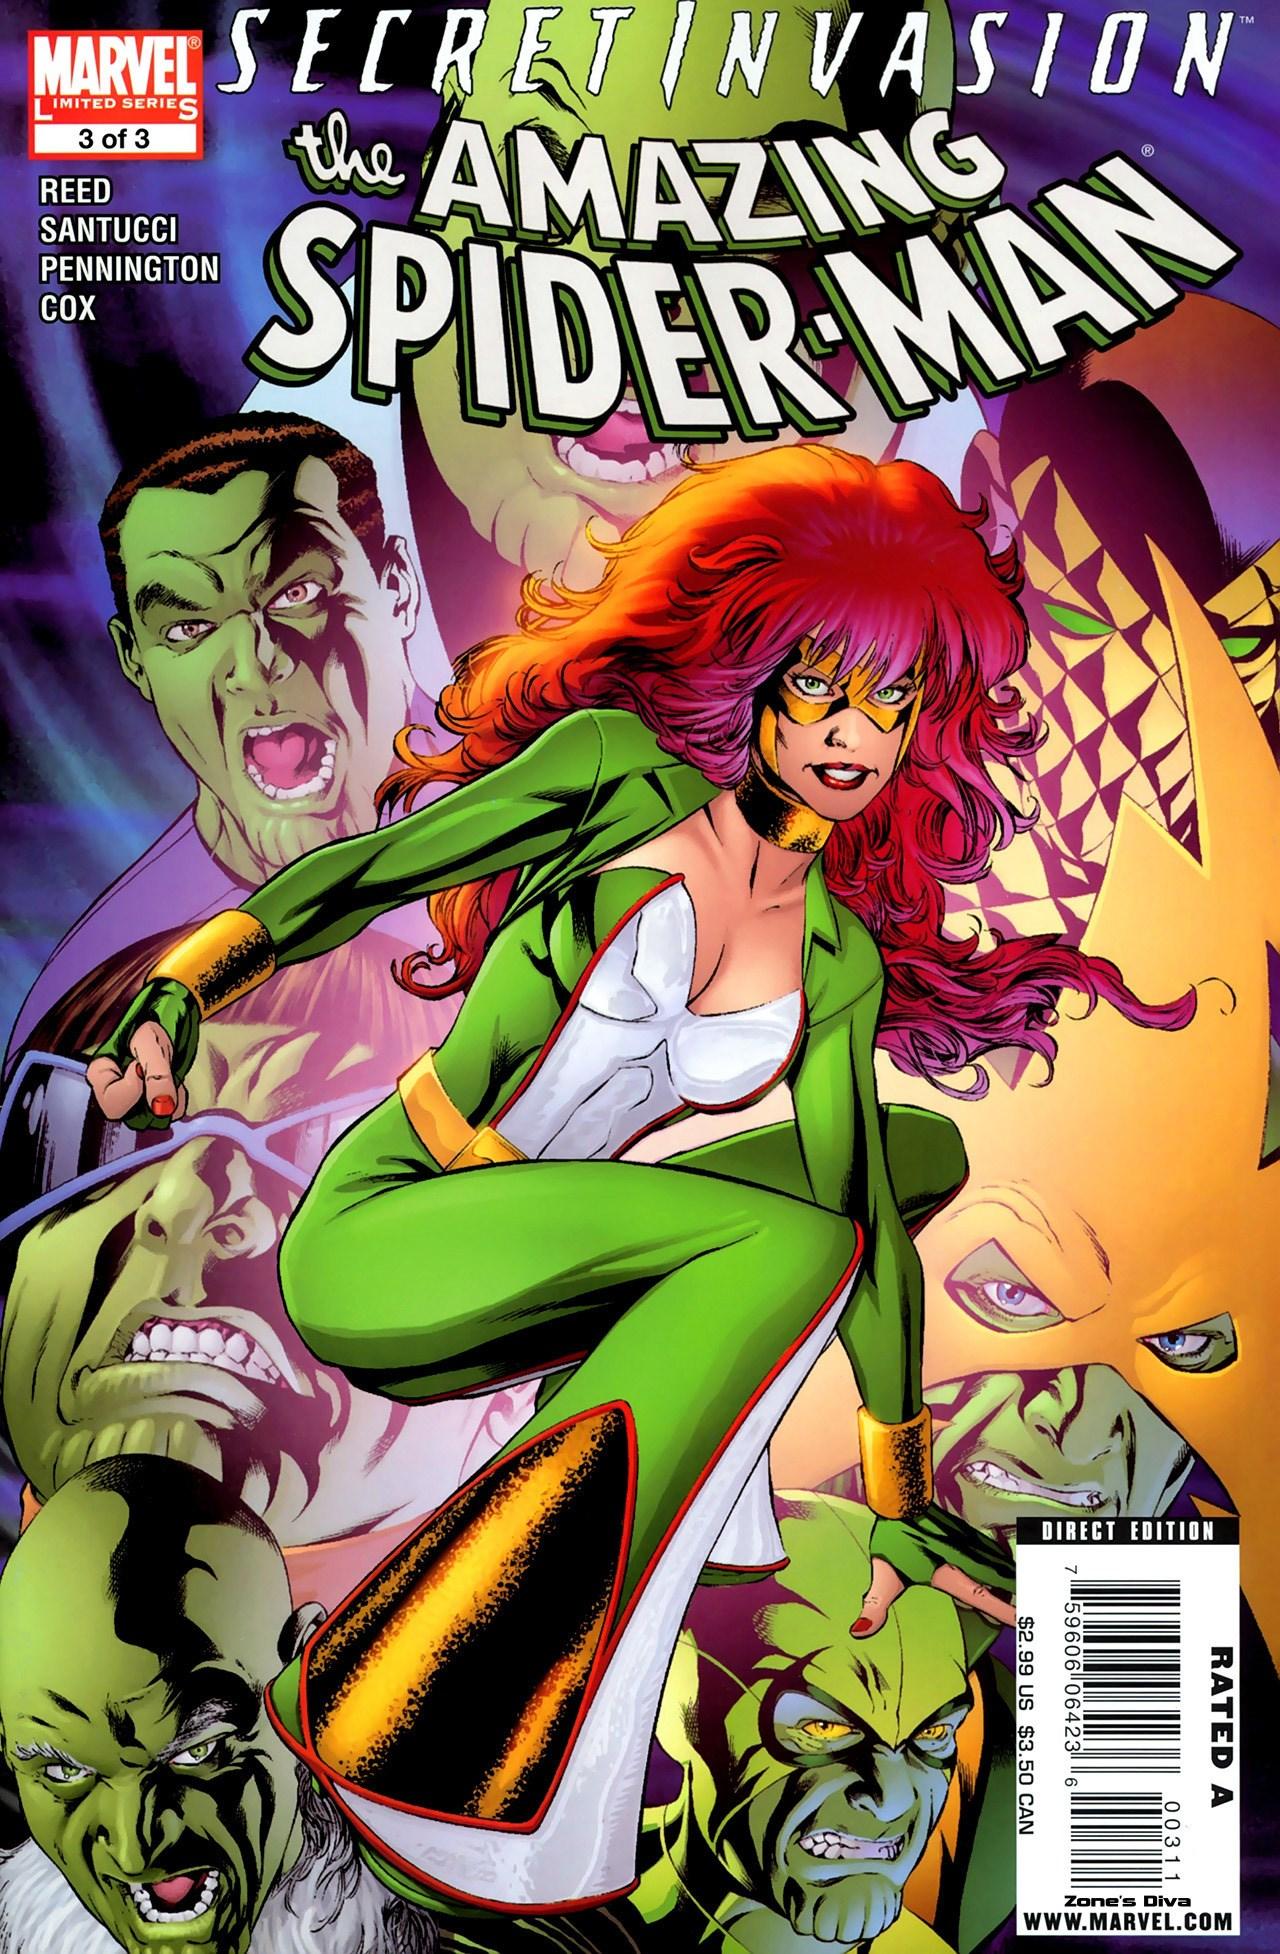 Secret Invasion: The Amazing Spider-Man Vol 1 3